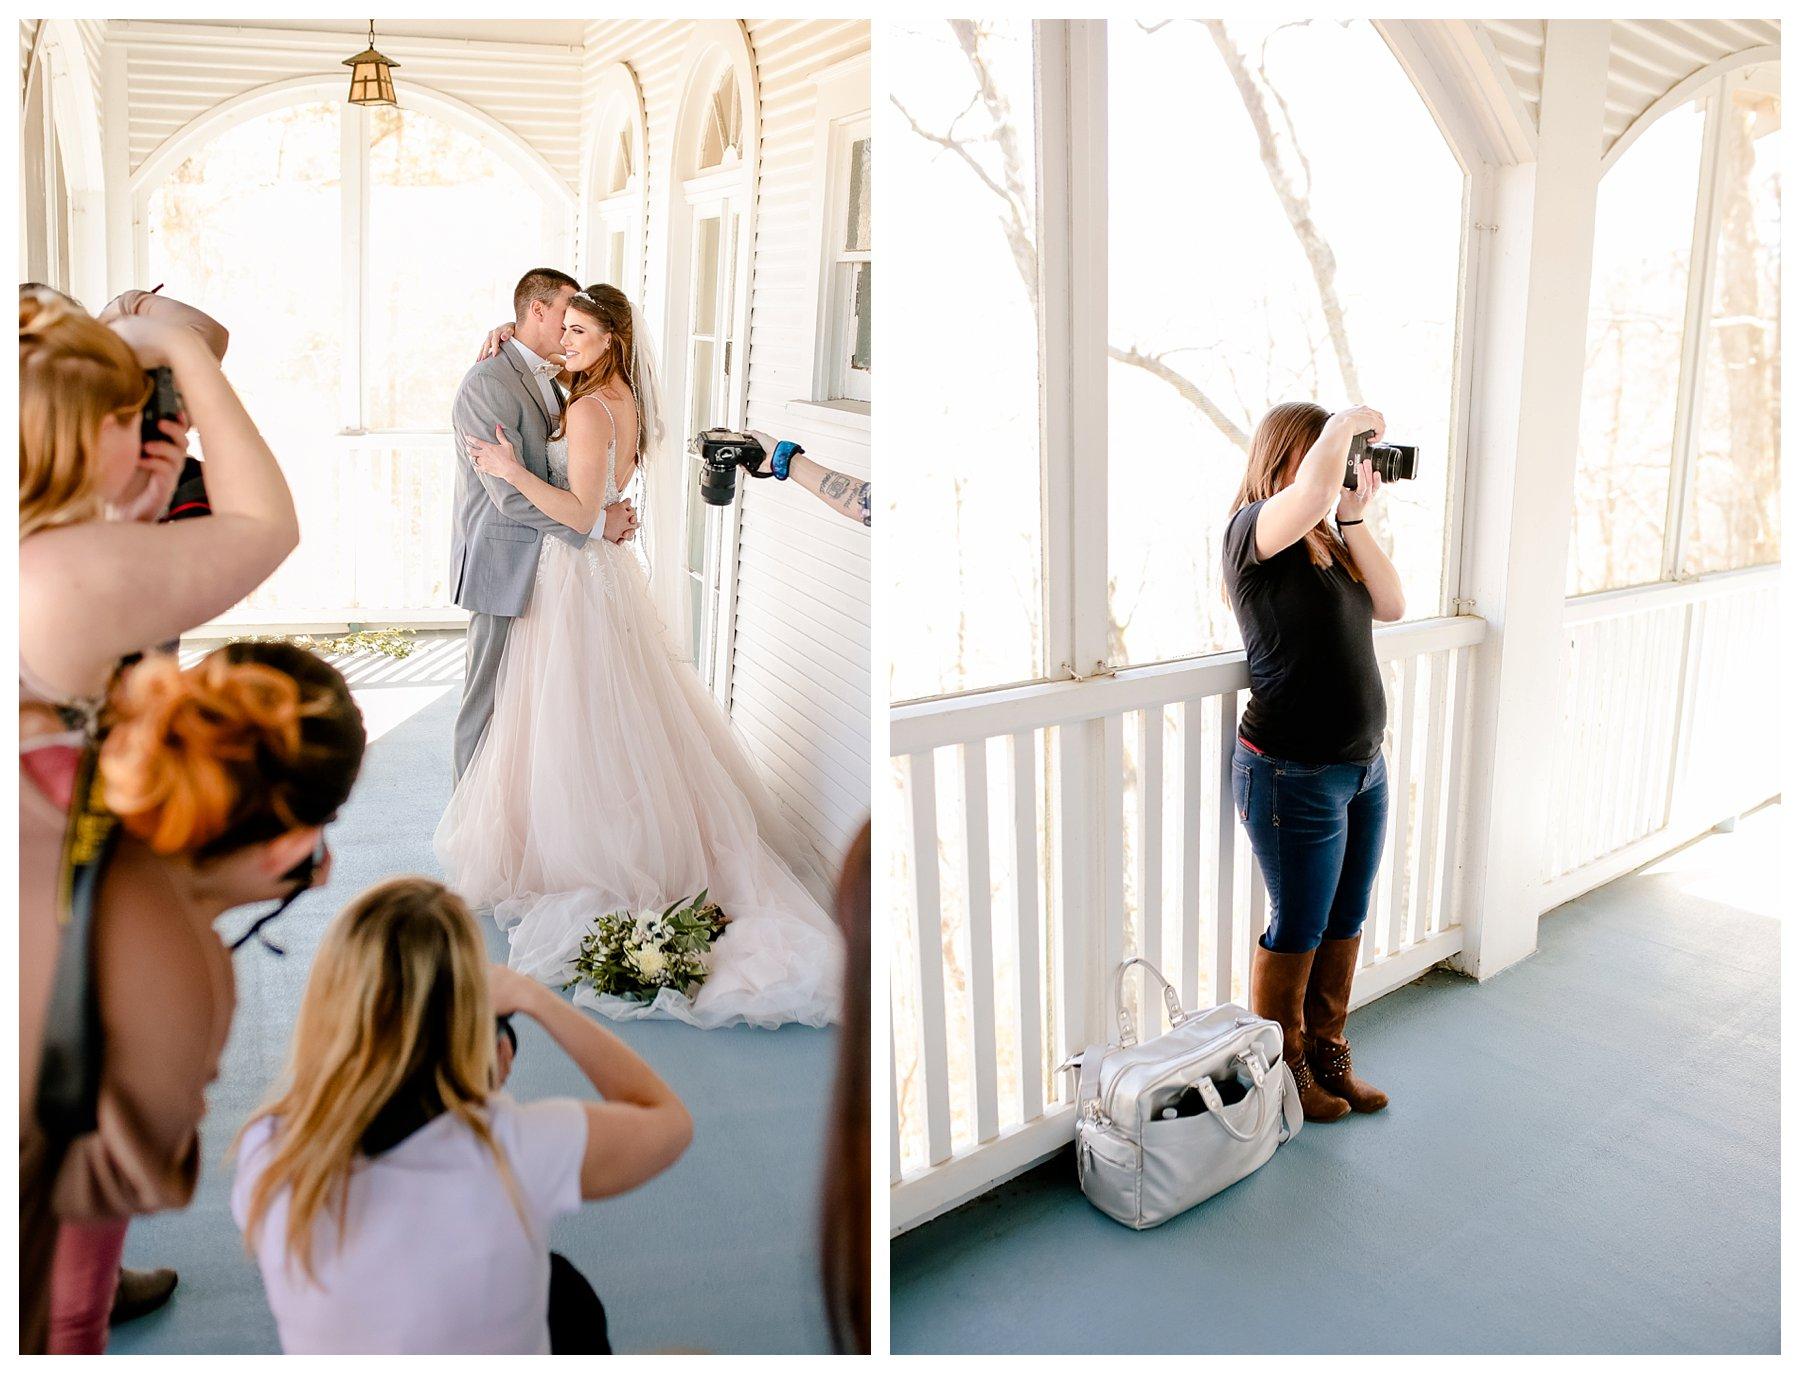 photographer_wedding_saint_louis_Kansas_City_Photography_Videography_workshop_training_styled_engagement_Lake_Ozark_KC_MO_STL_Rolla_Hermann_Saint_James_0401.jpg